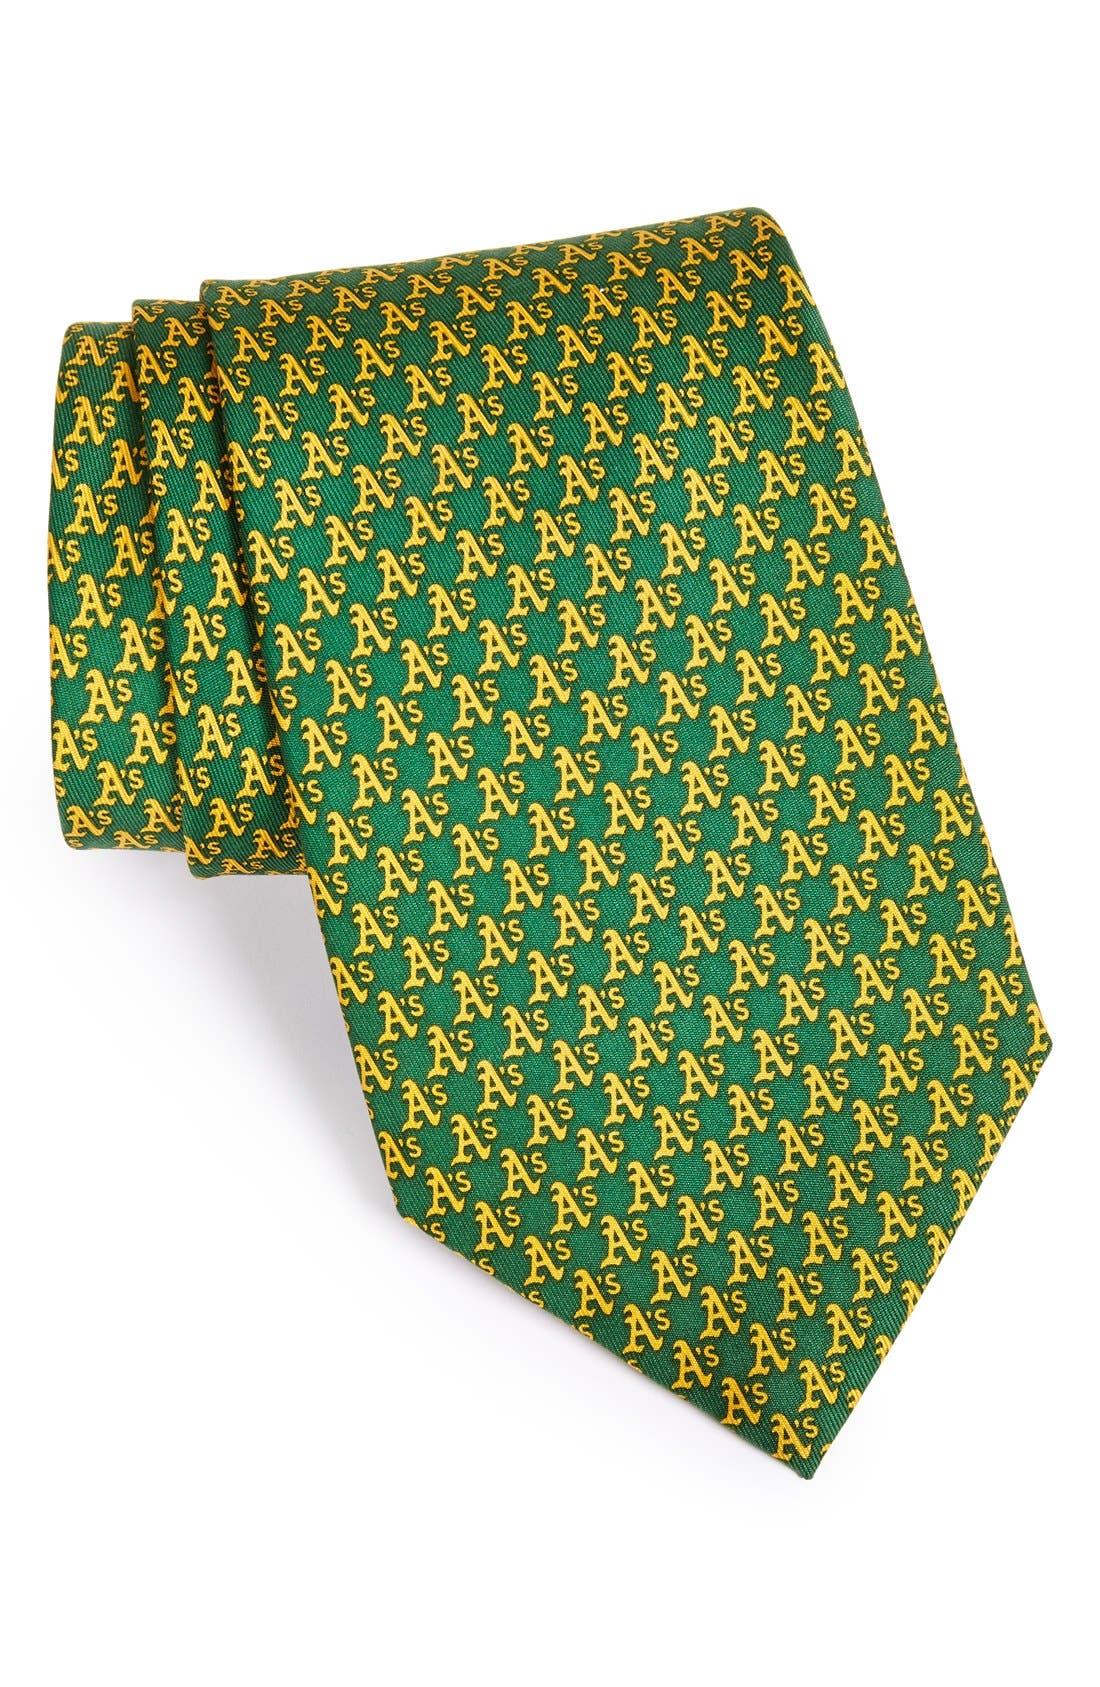 Vineyard Vines 'Oakland Athletics - MLB' Woven Silk Tie